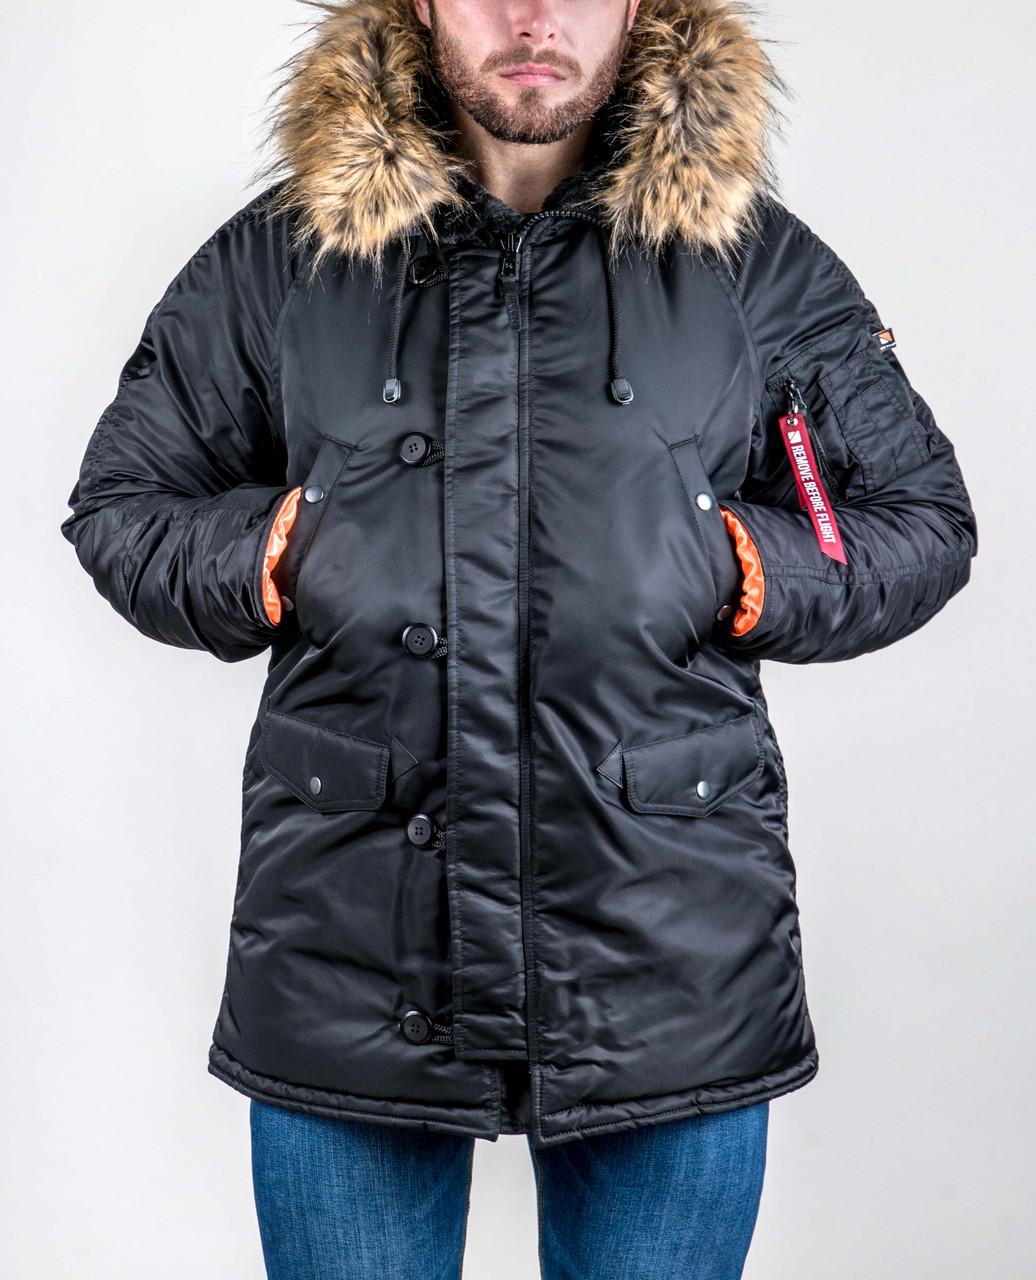 Зимняя мужская куртка аляска Olymp - N-3B, Slim Fit, Color: Black (100% Нейлон)